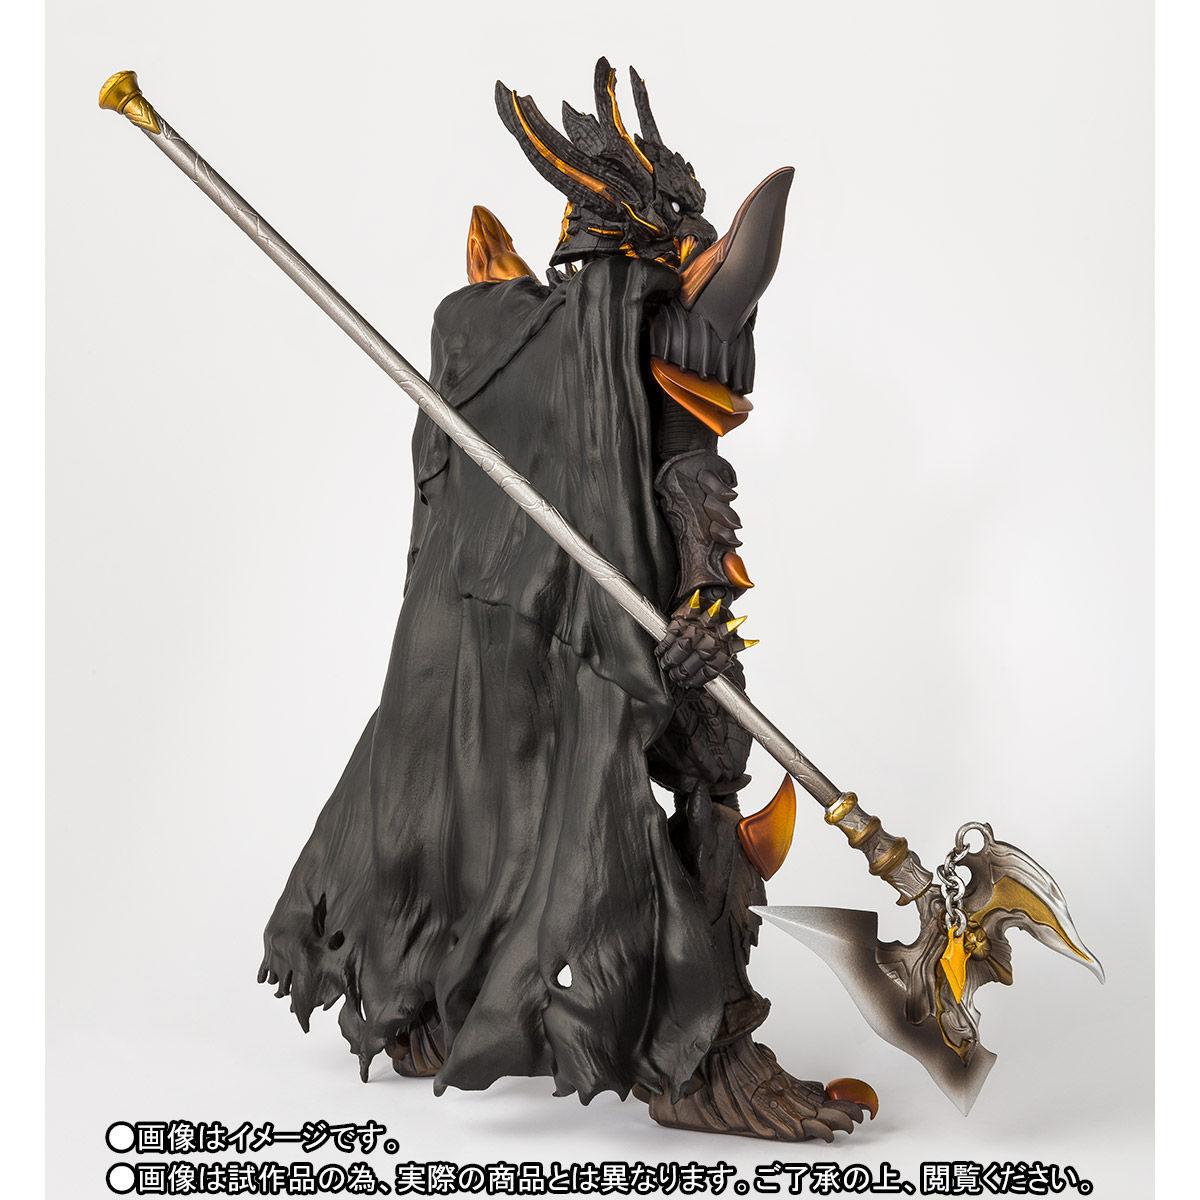 Figuarts(真骨彫製法) 暗黒騎士キバ予約8